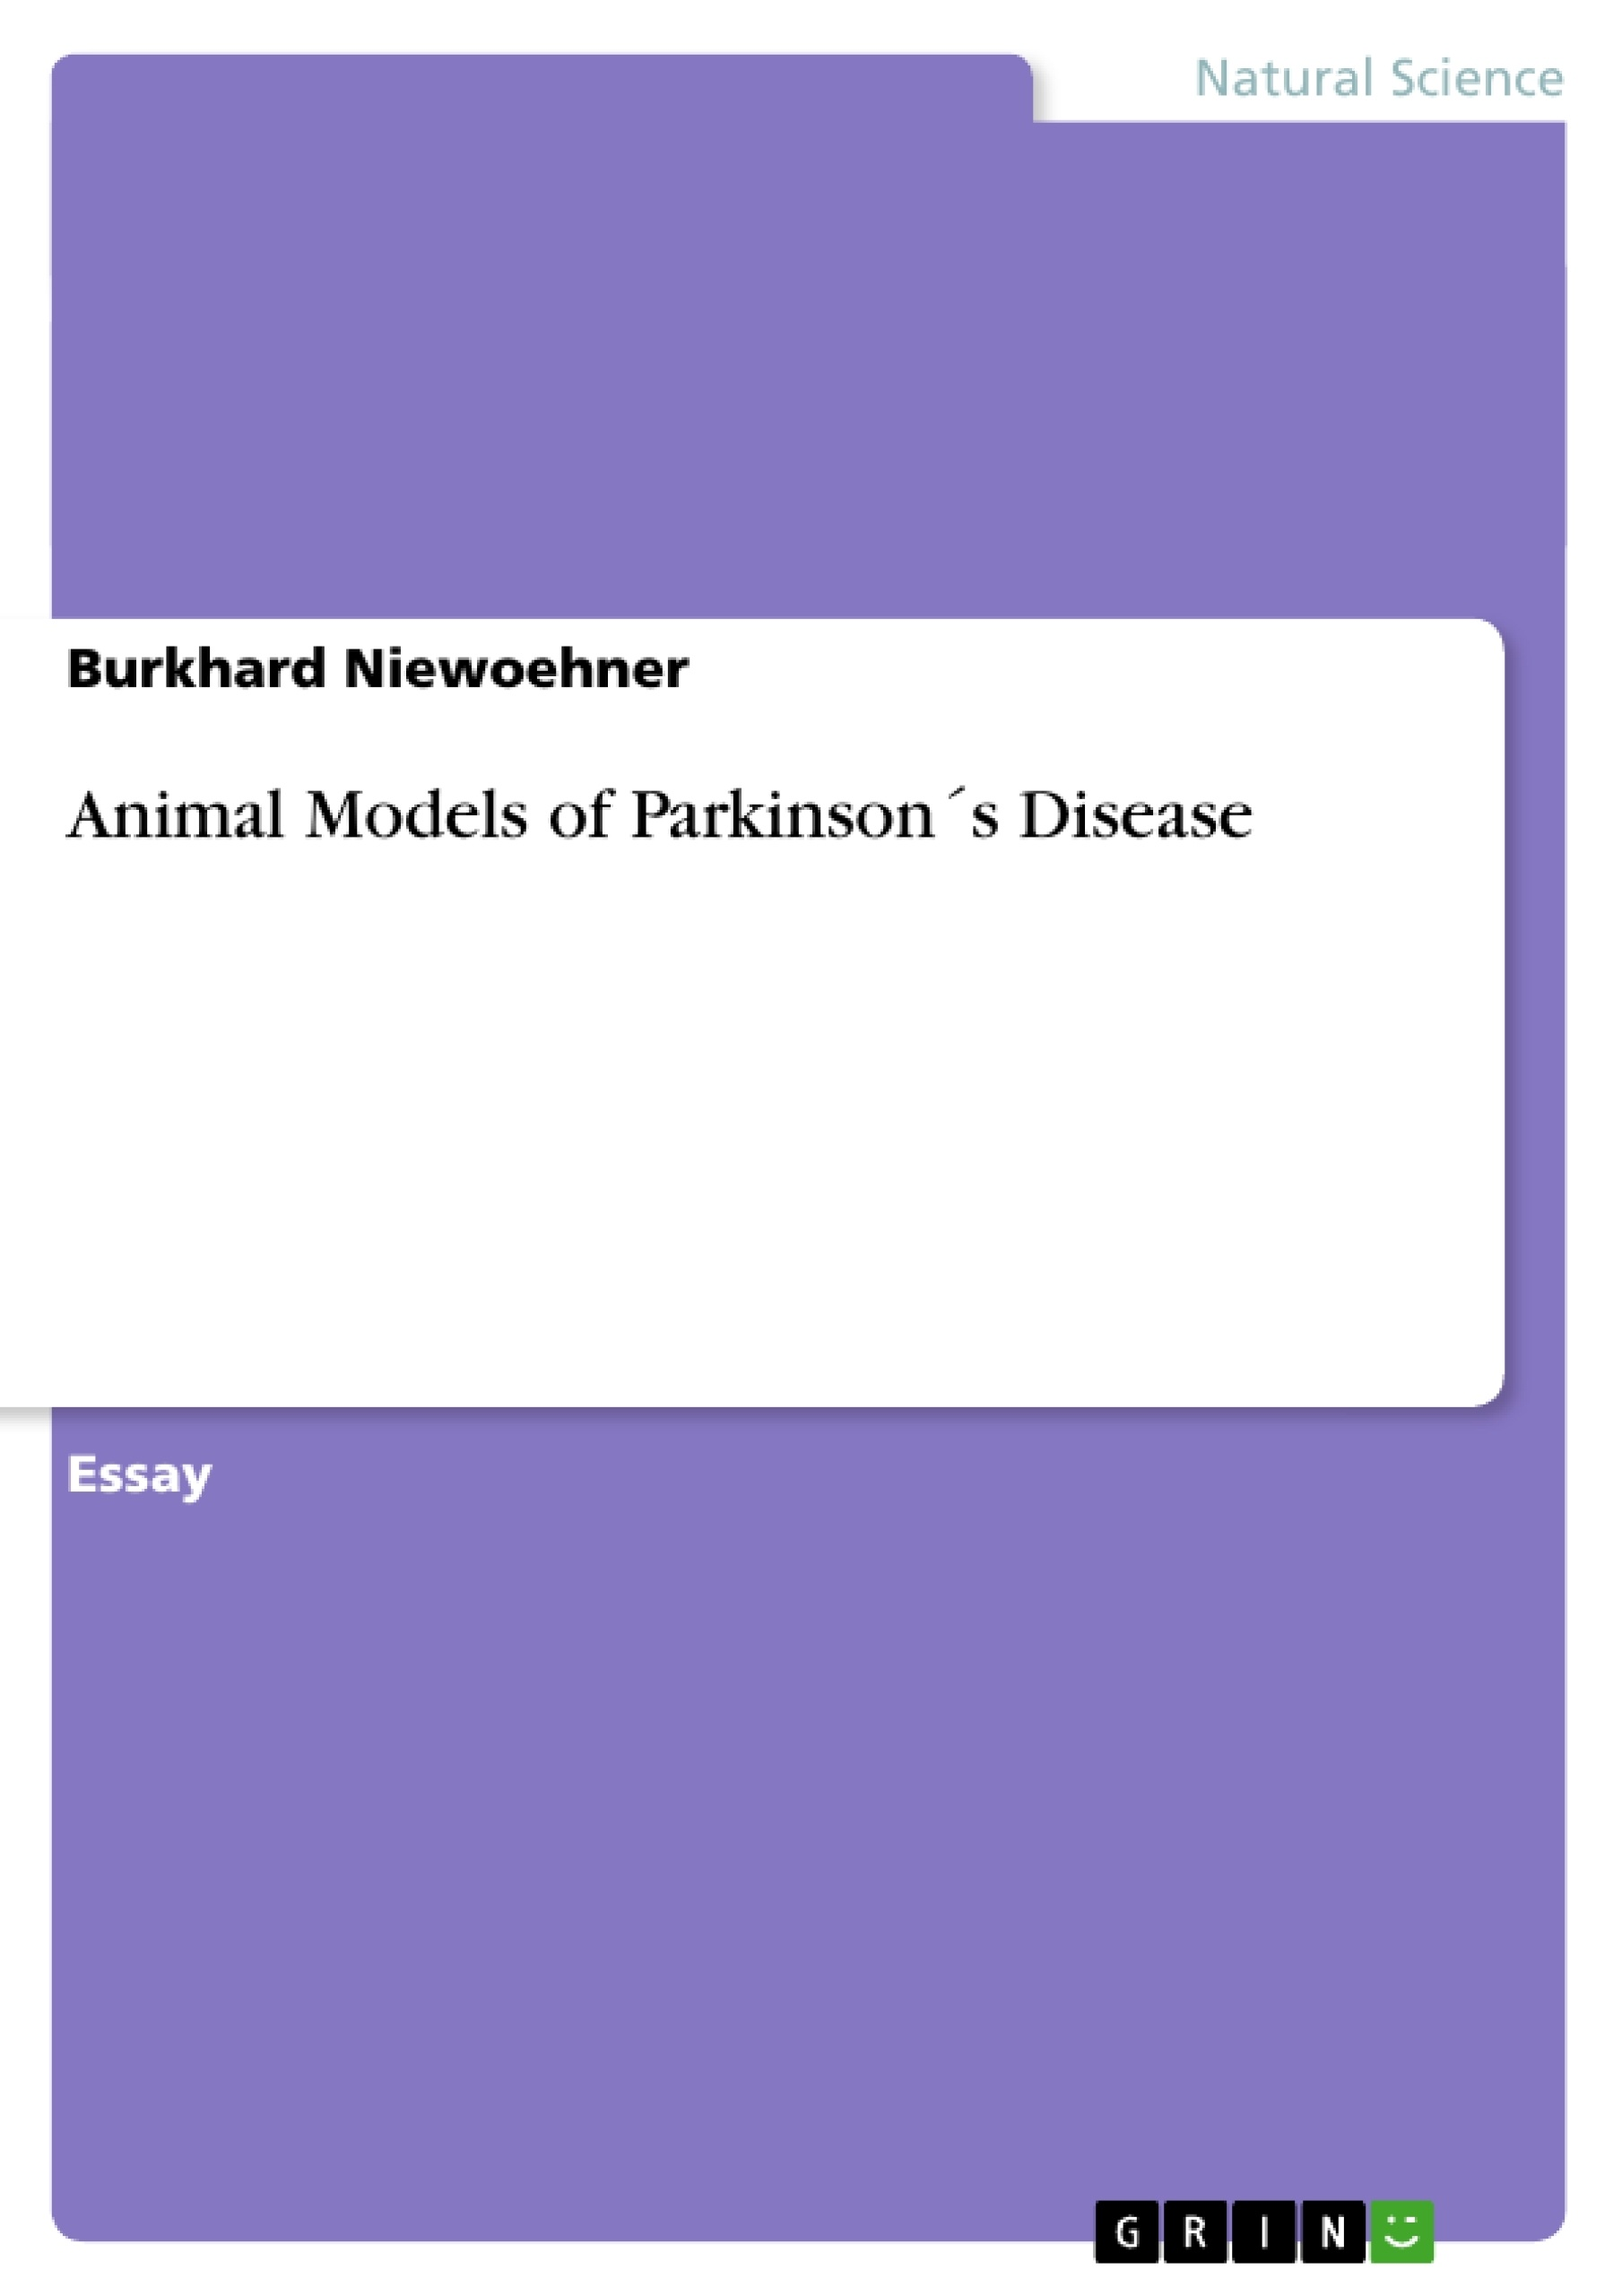 Title: Animal Models of Parkinson´s Disease